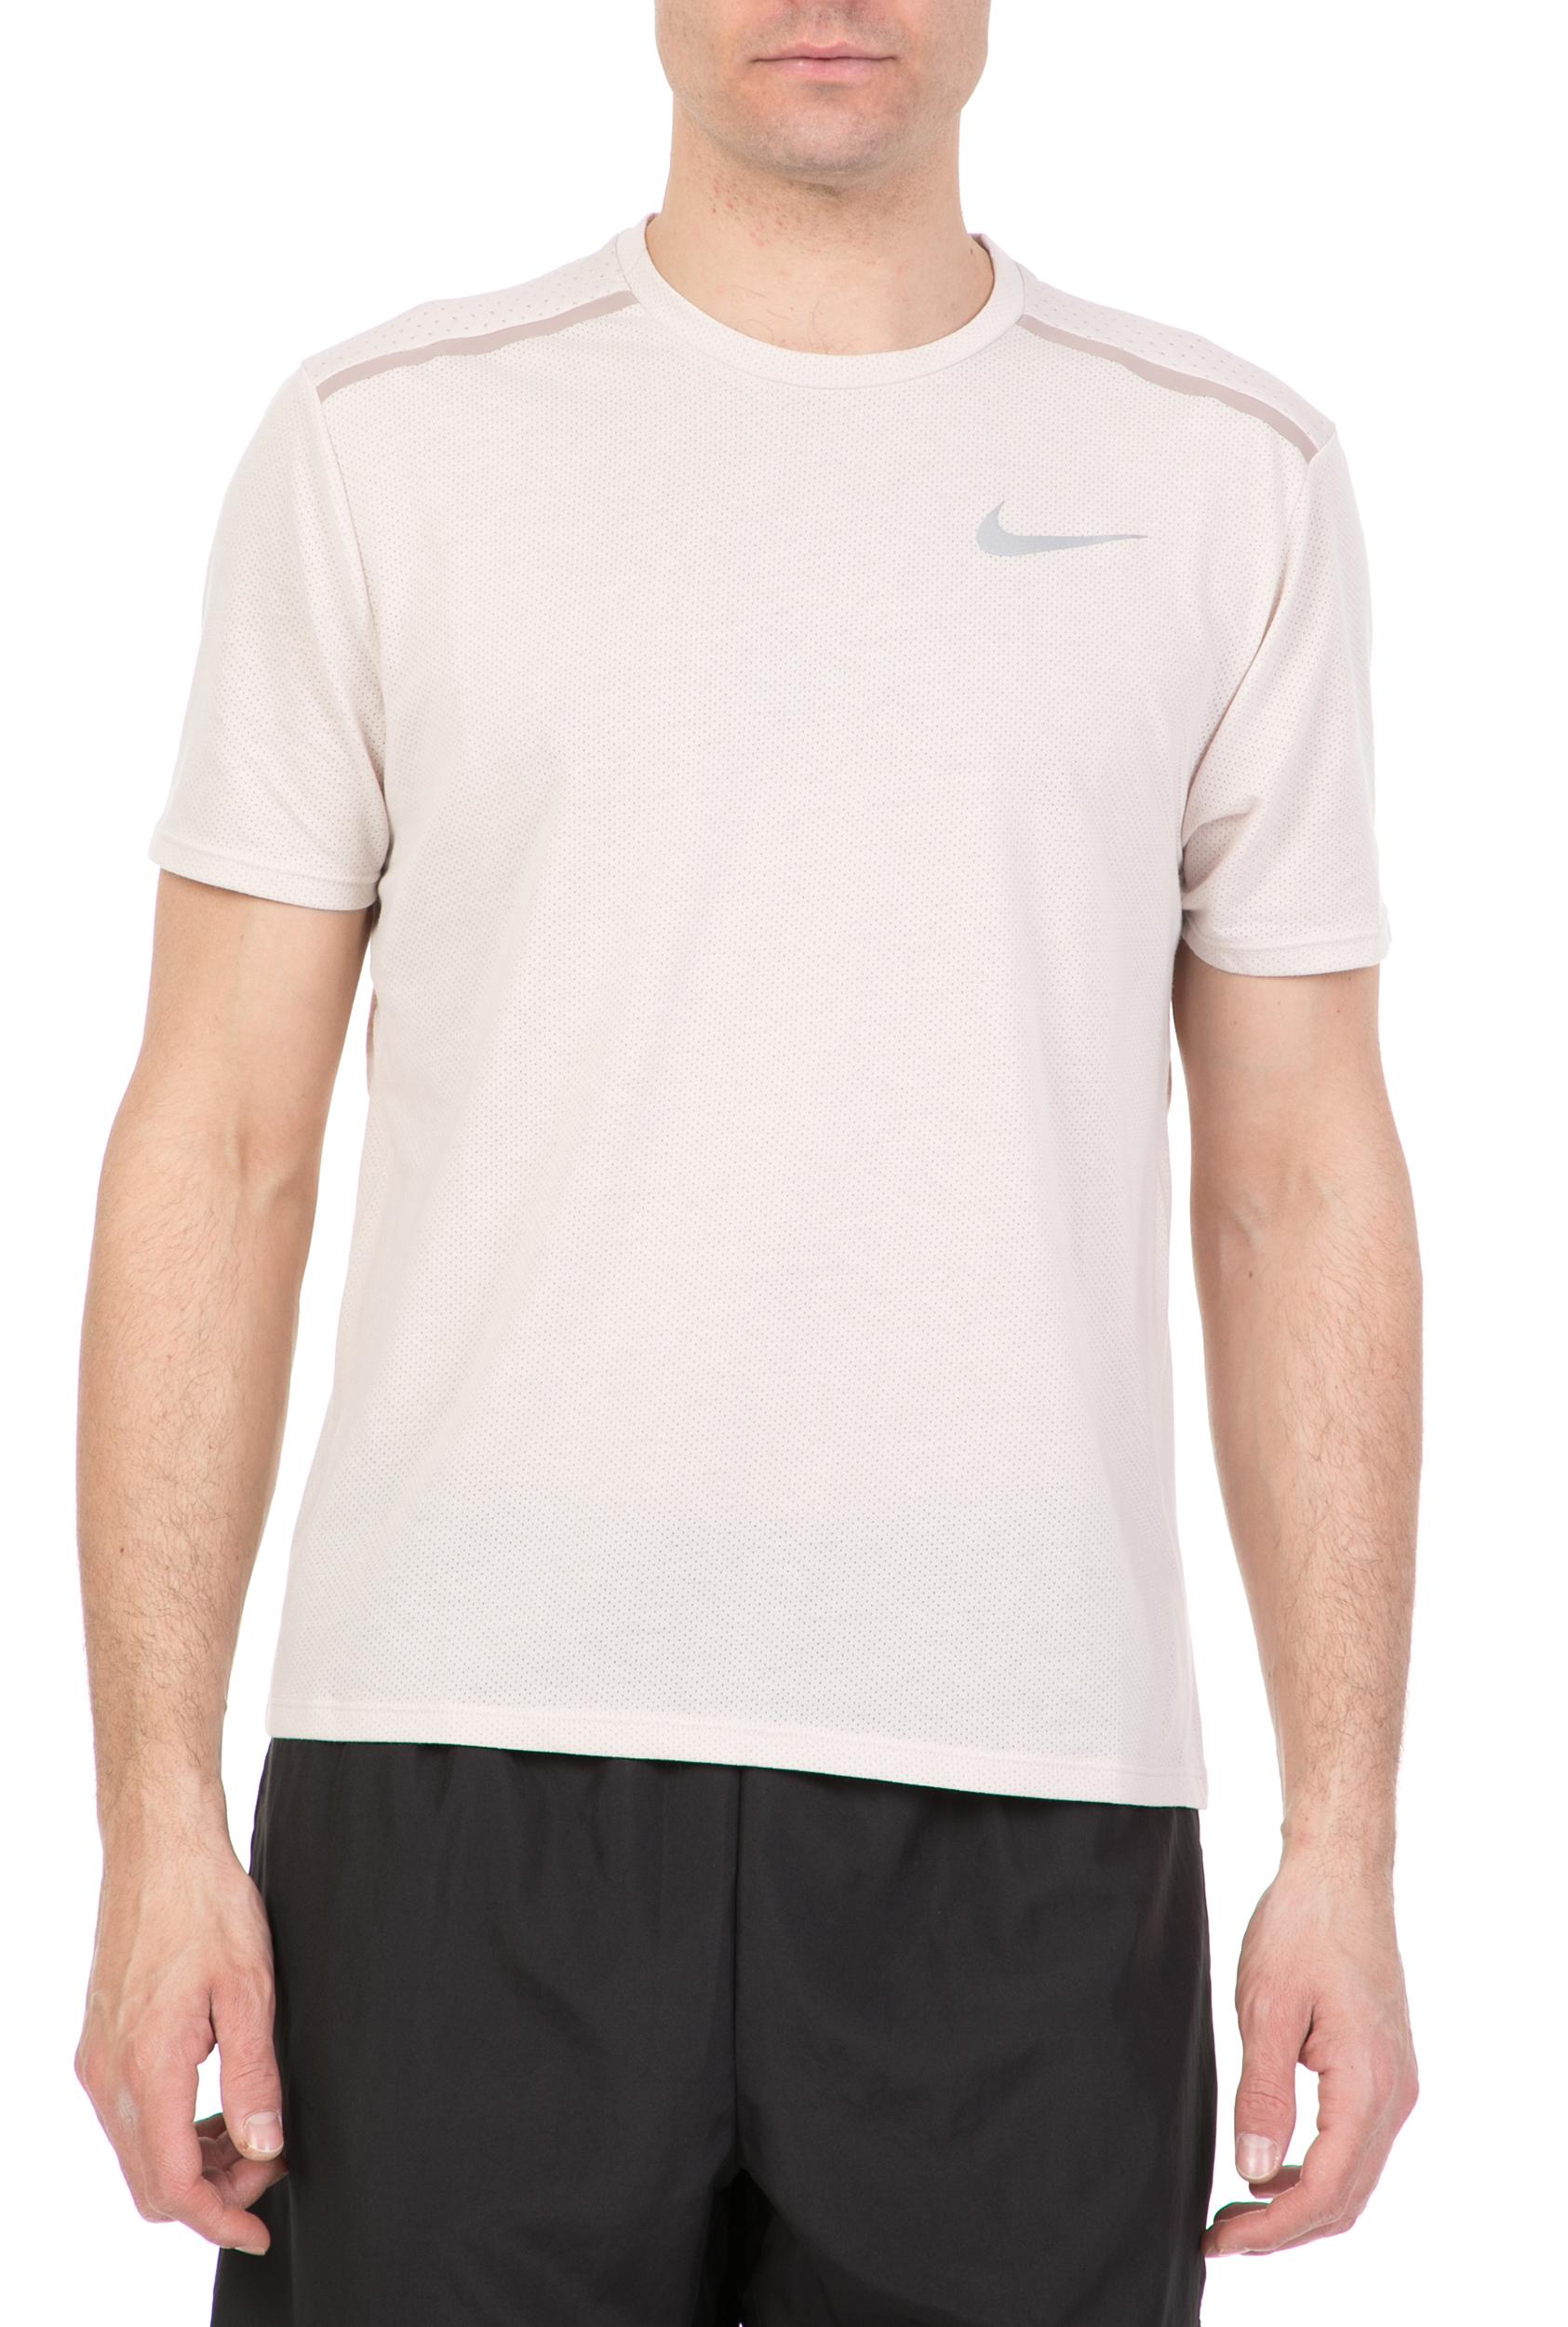 e9329d94ef3b NIKE - Ανδρική κοντομάνικη μπλούζα για τρέξιμο Nike Breathe εκρού